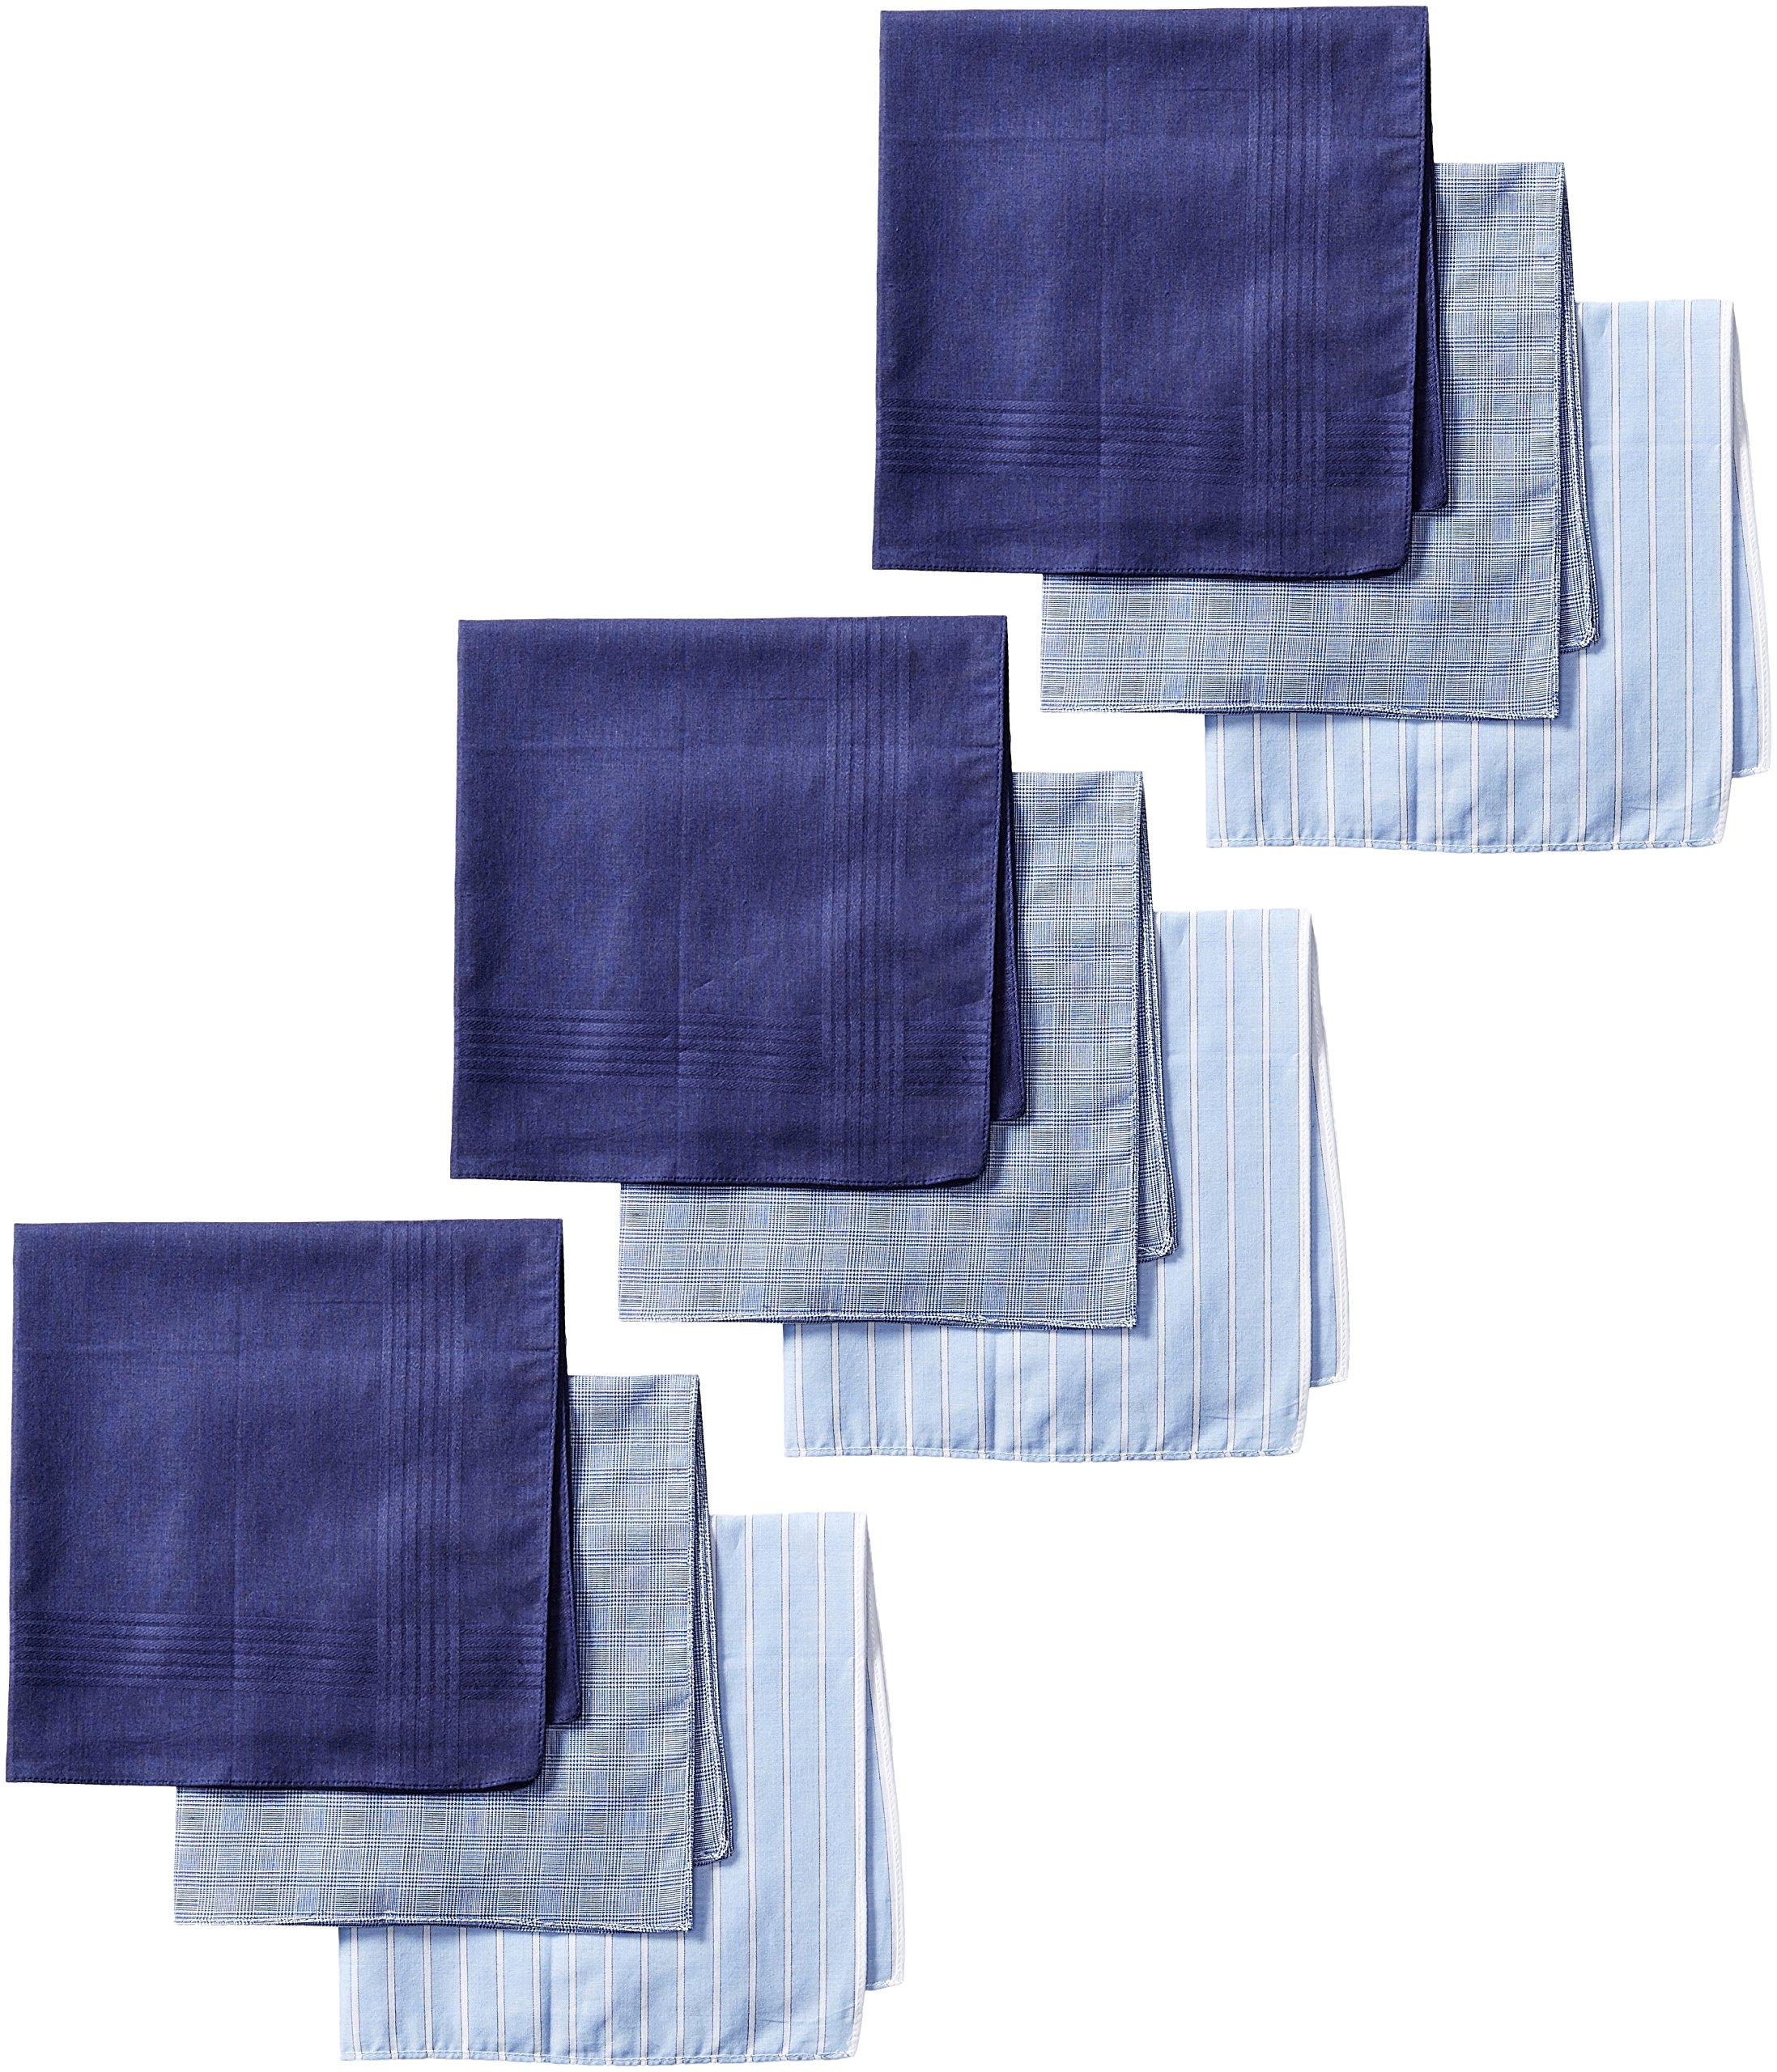 Dockers Men's 9 Piece Hankie Gift Set,Blue Assorted,One Size